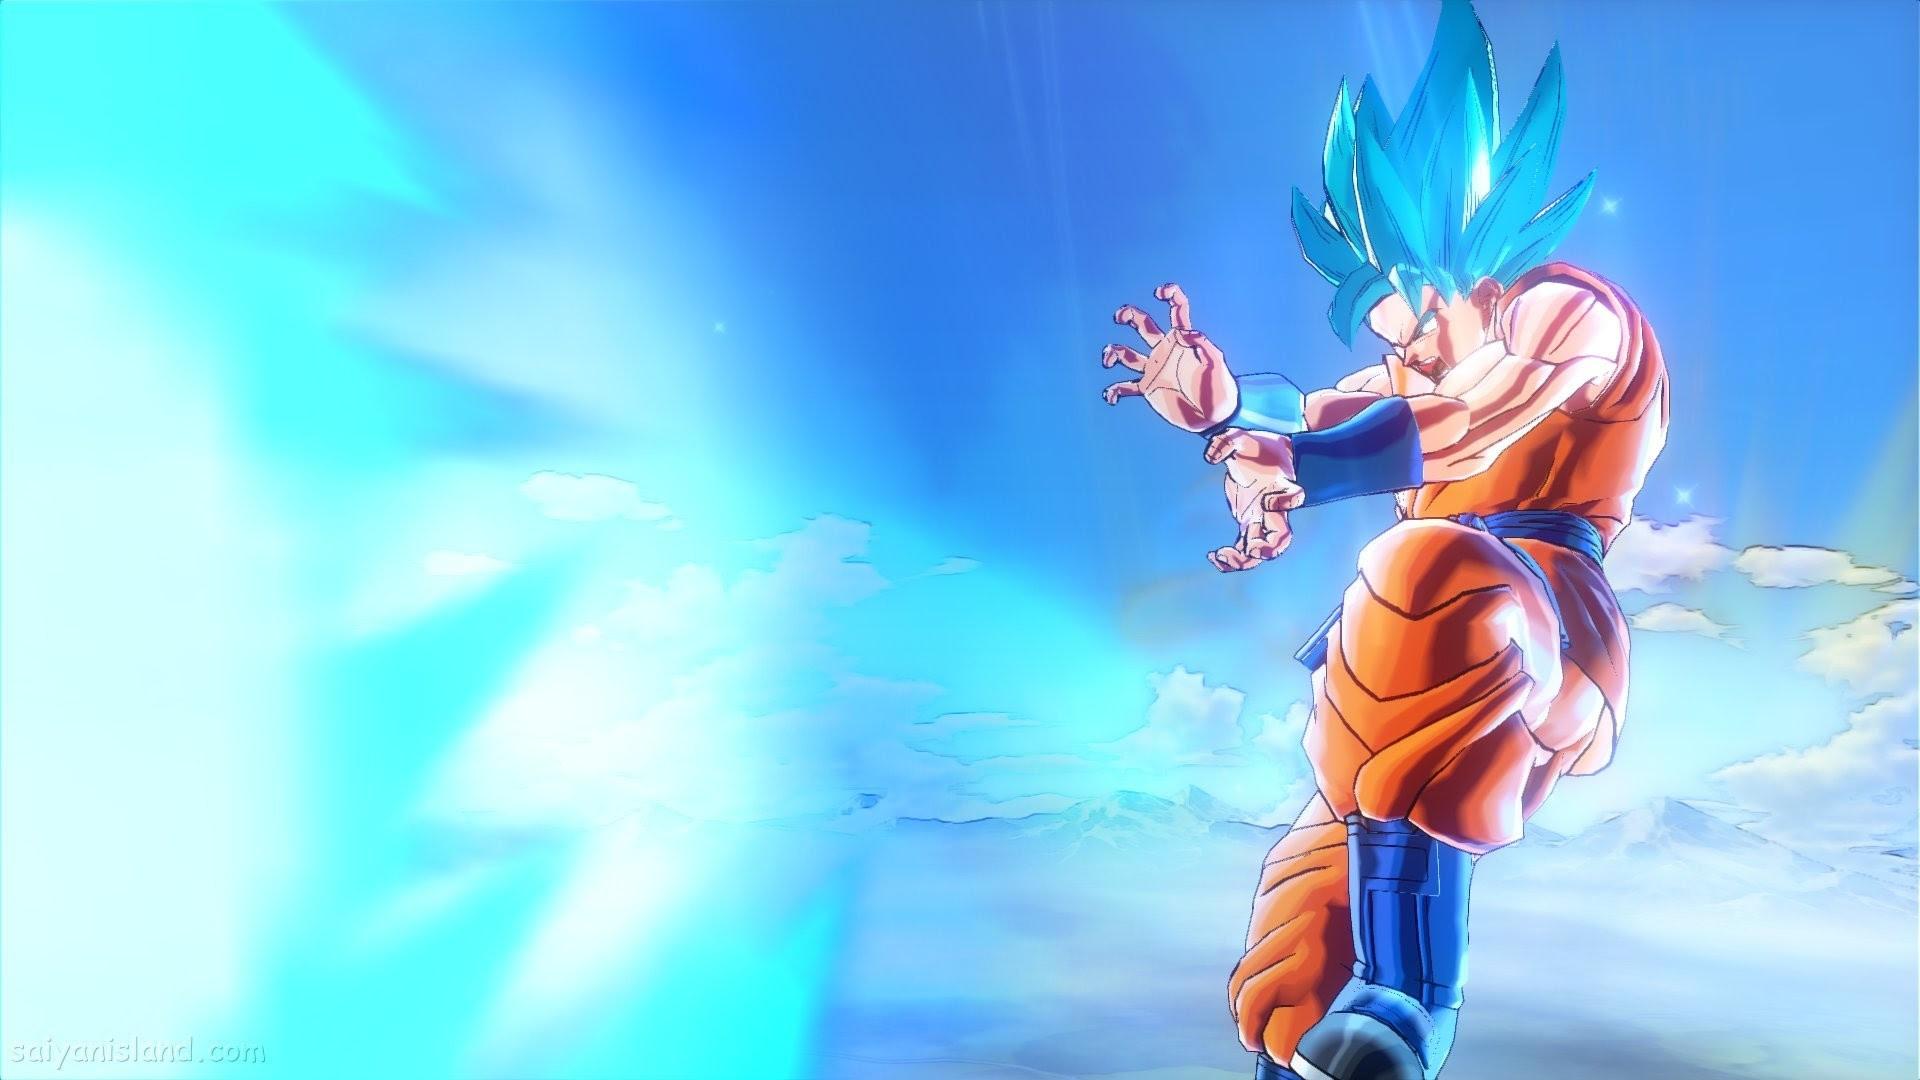 Goku Live Wallpaper For Iphone 6s  impremedia.net